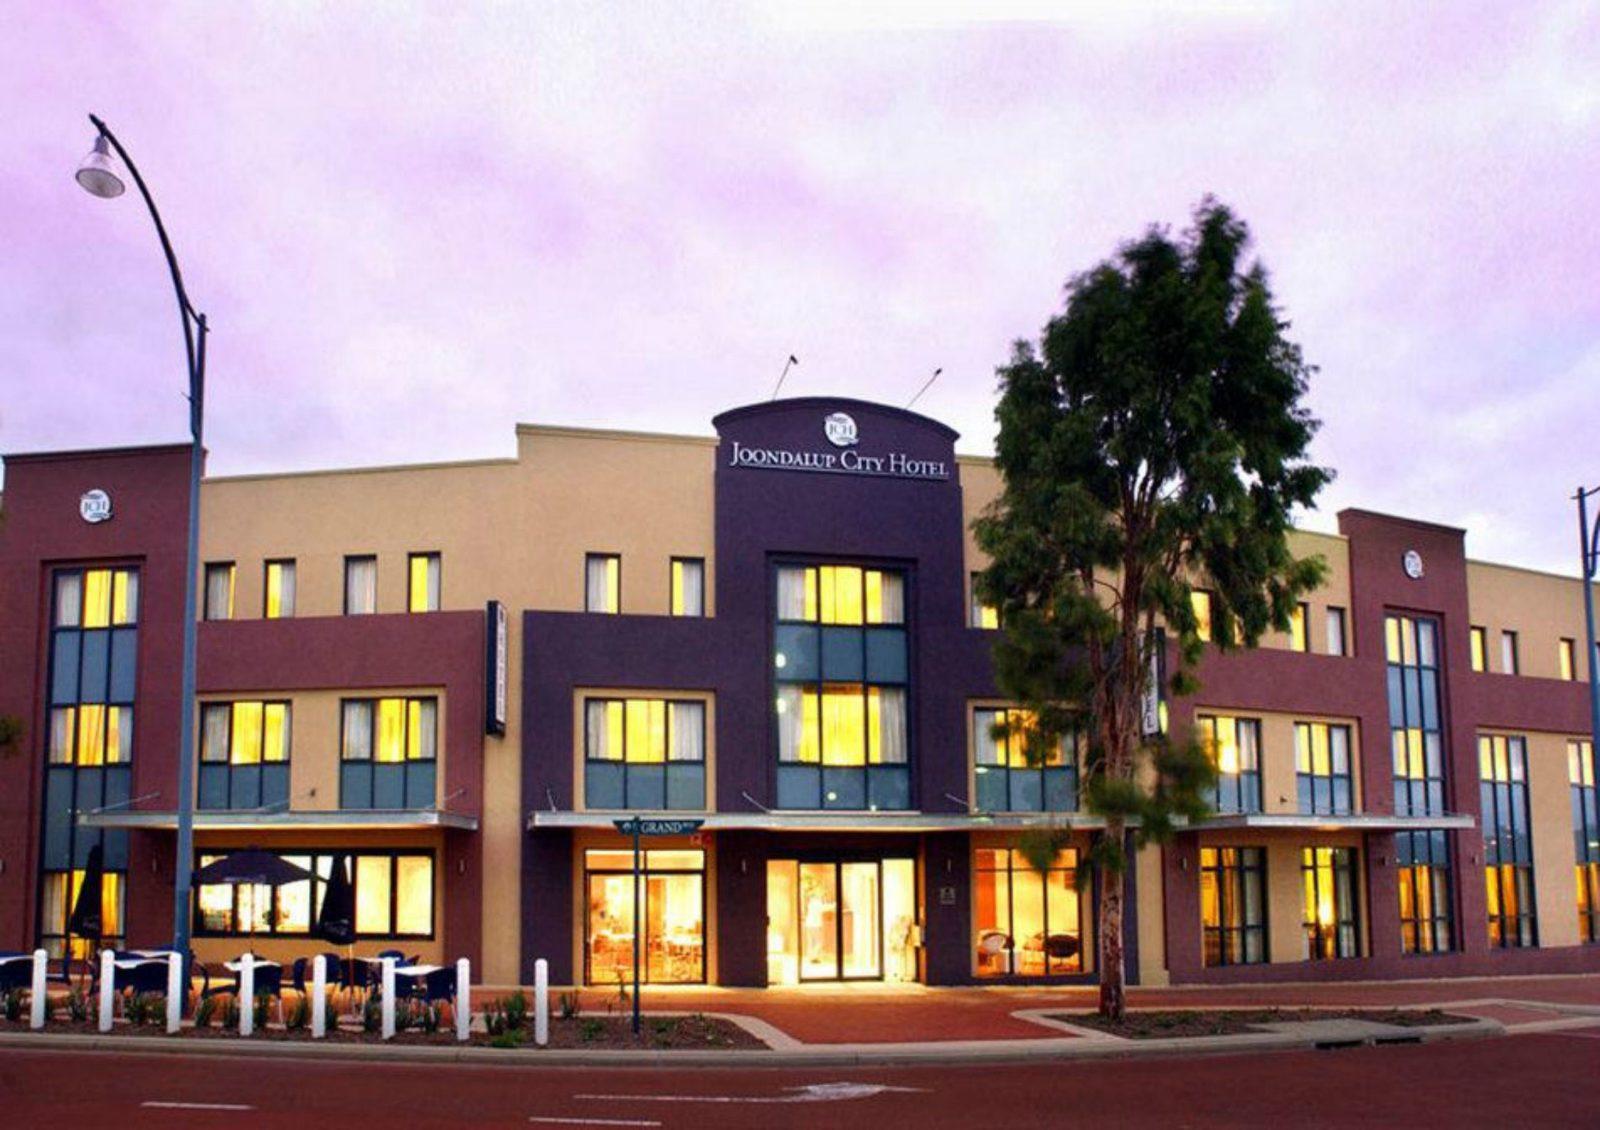 Joondalup City Hotel, Joondalup, Western Australia